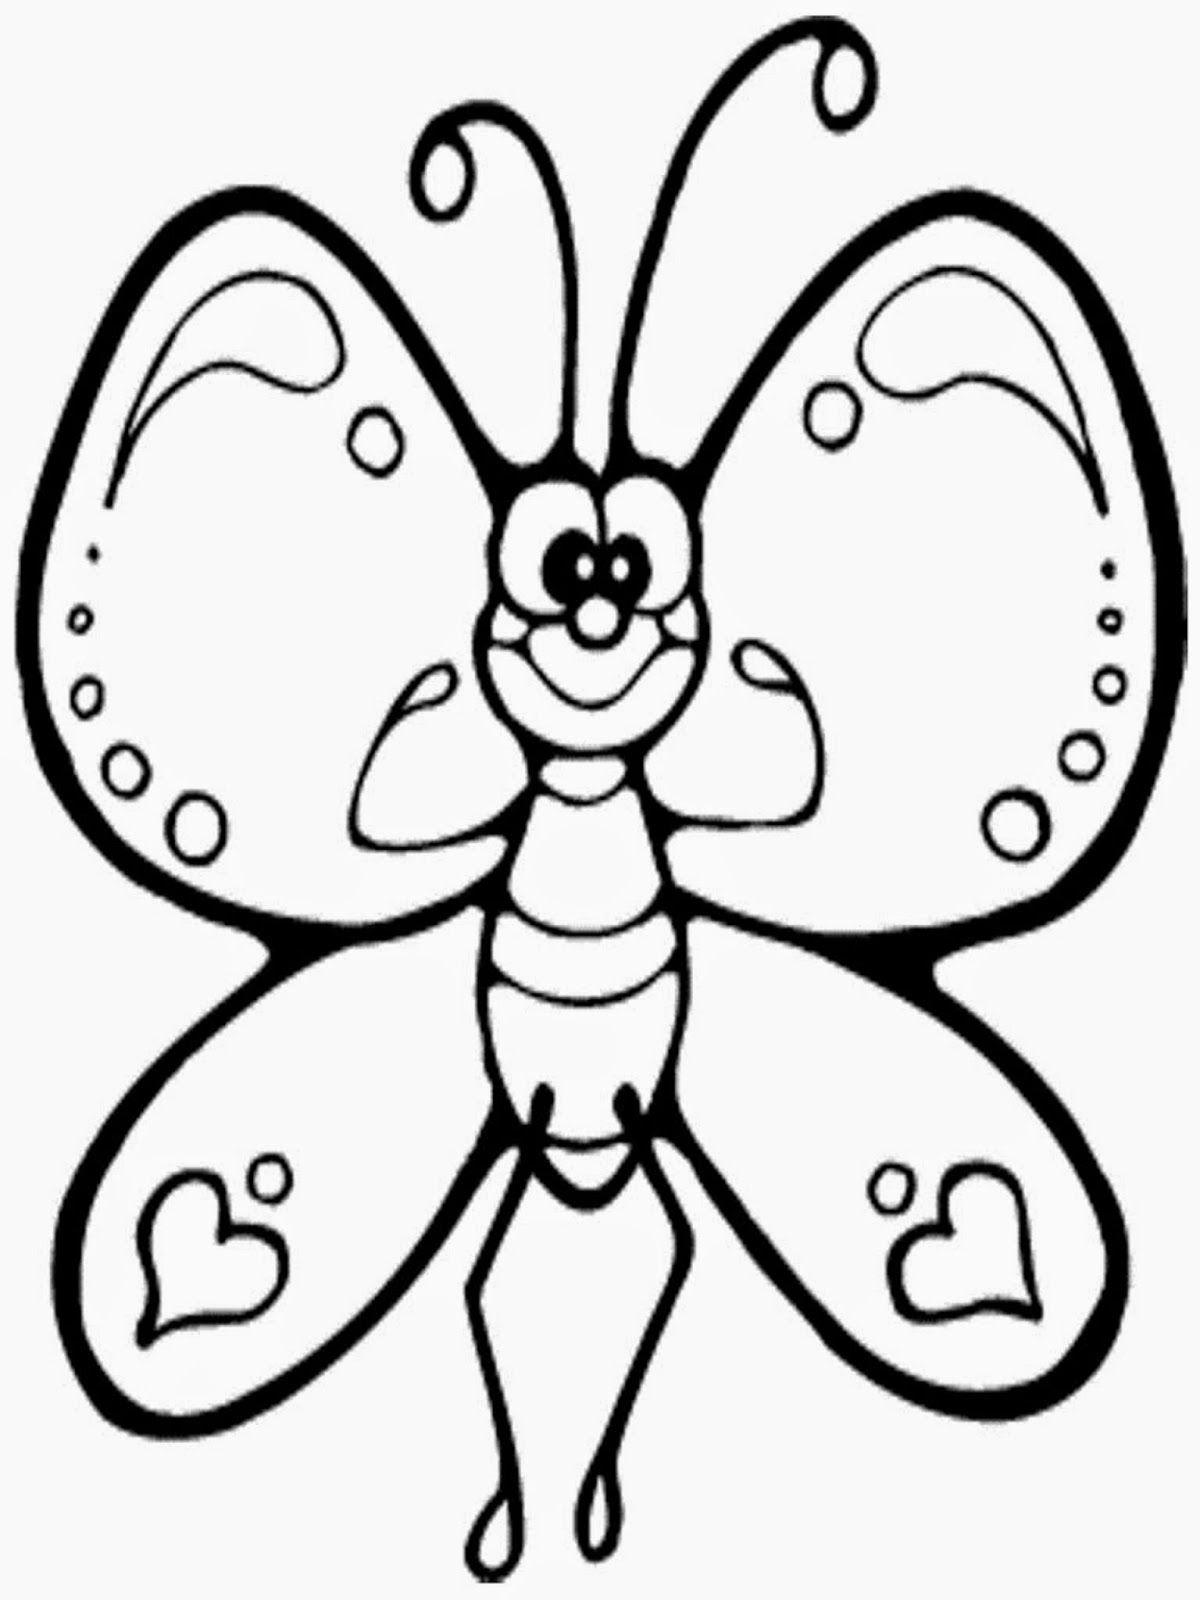 Beautiful Colour Butterflies Drawing Hd Wallpaper Mariposas Para Colorear Imagenes De Mariposas Dibujos De Mariposas Infantiles [ 1600 x 1200 Pixel ]